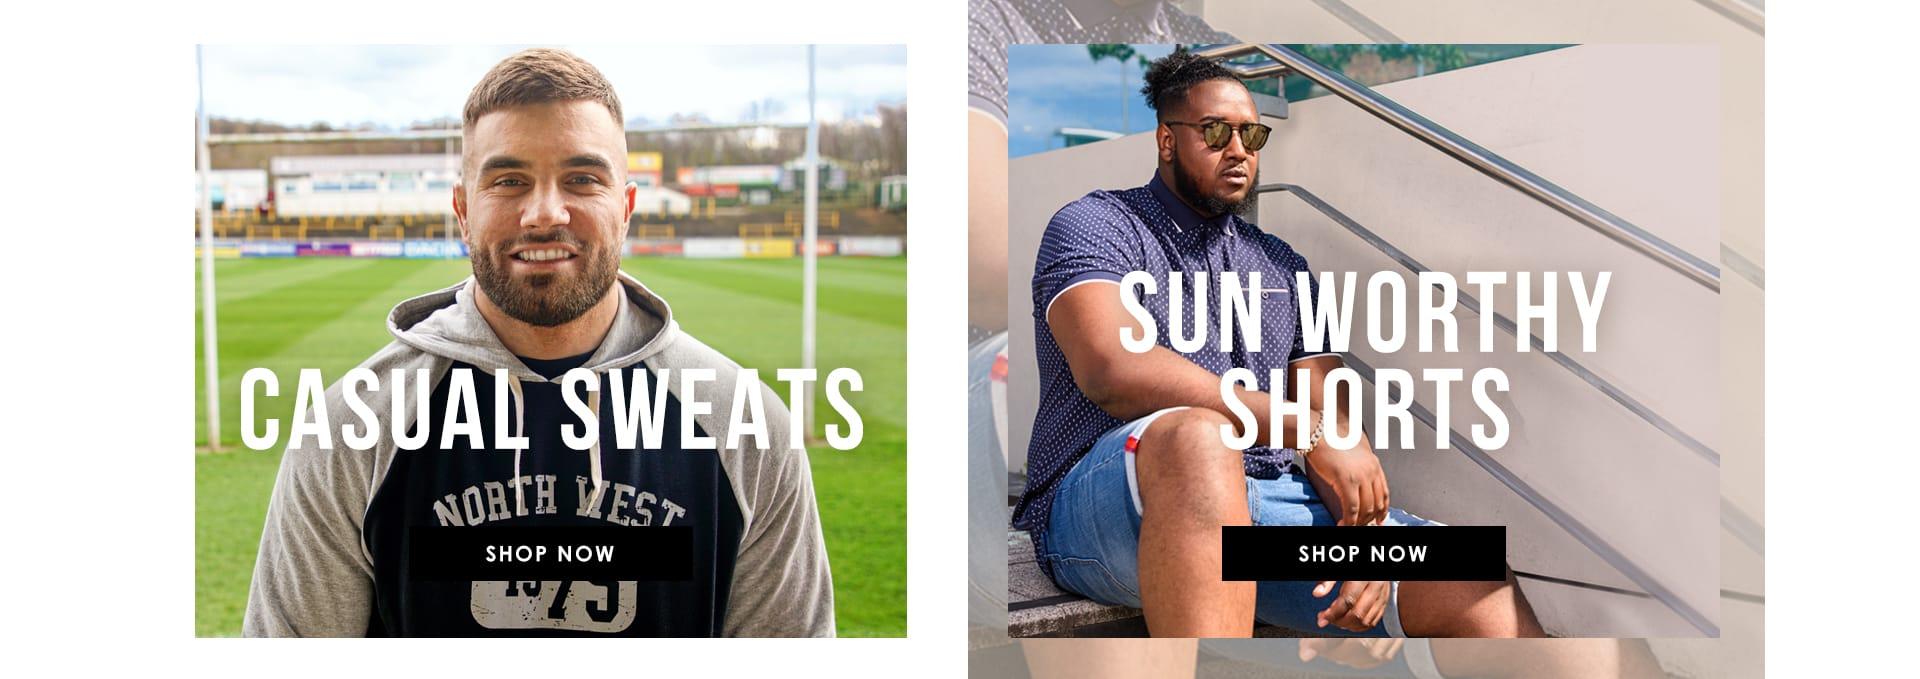 Sweats / Shorts